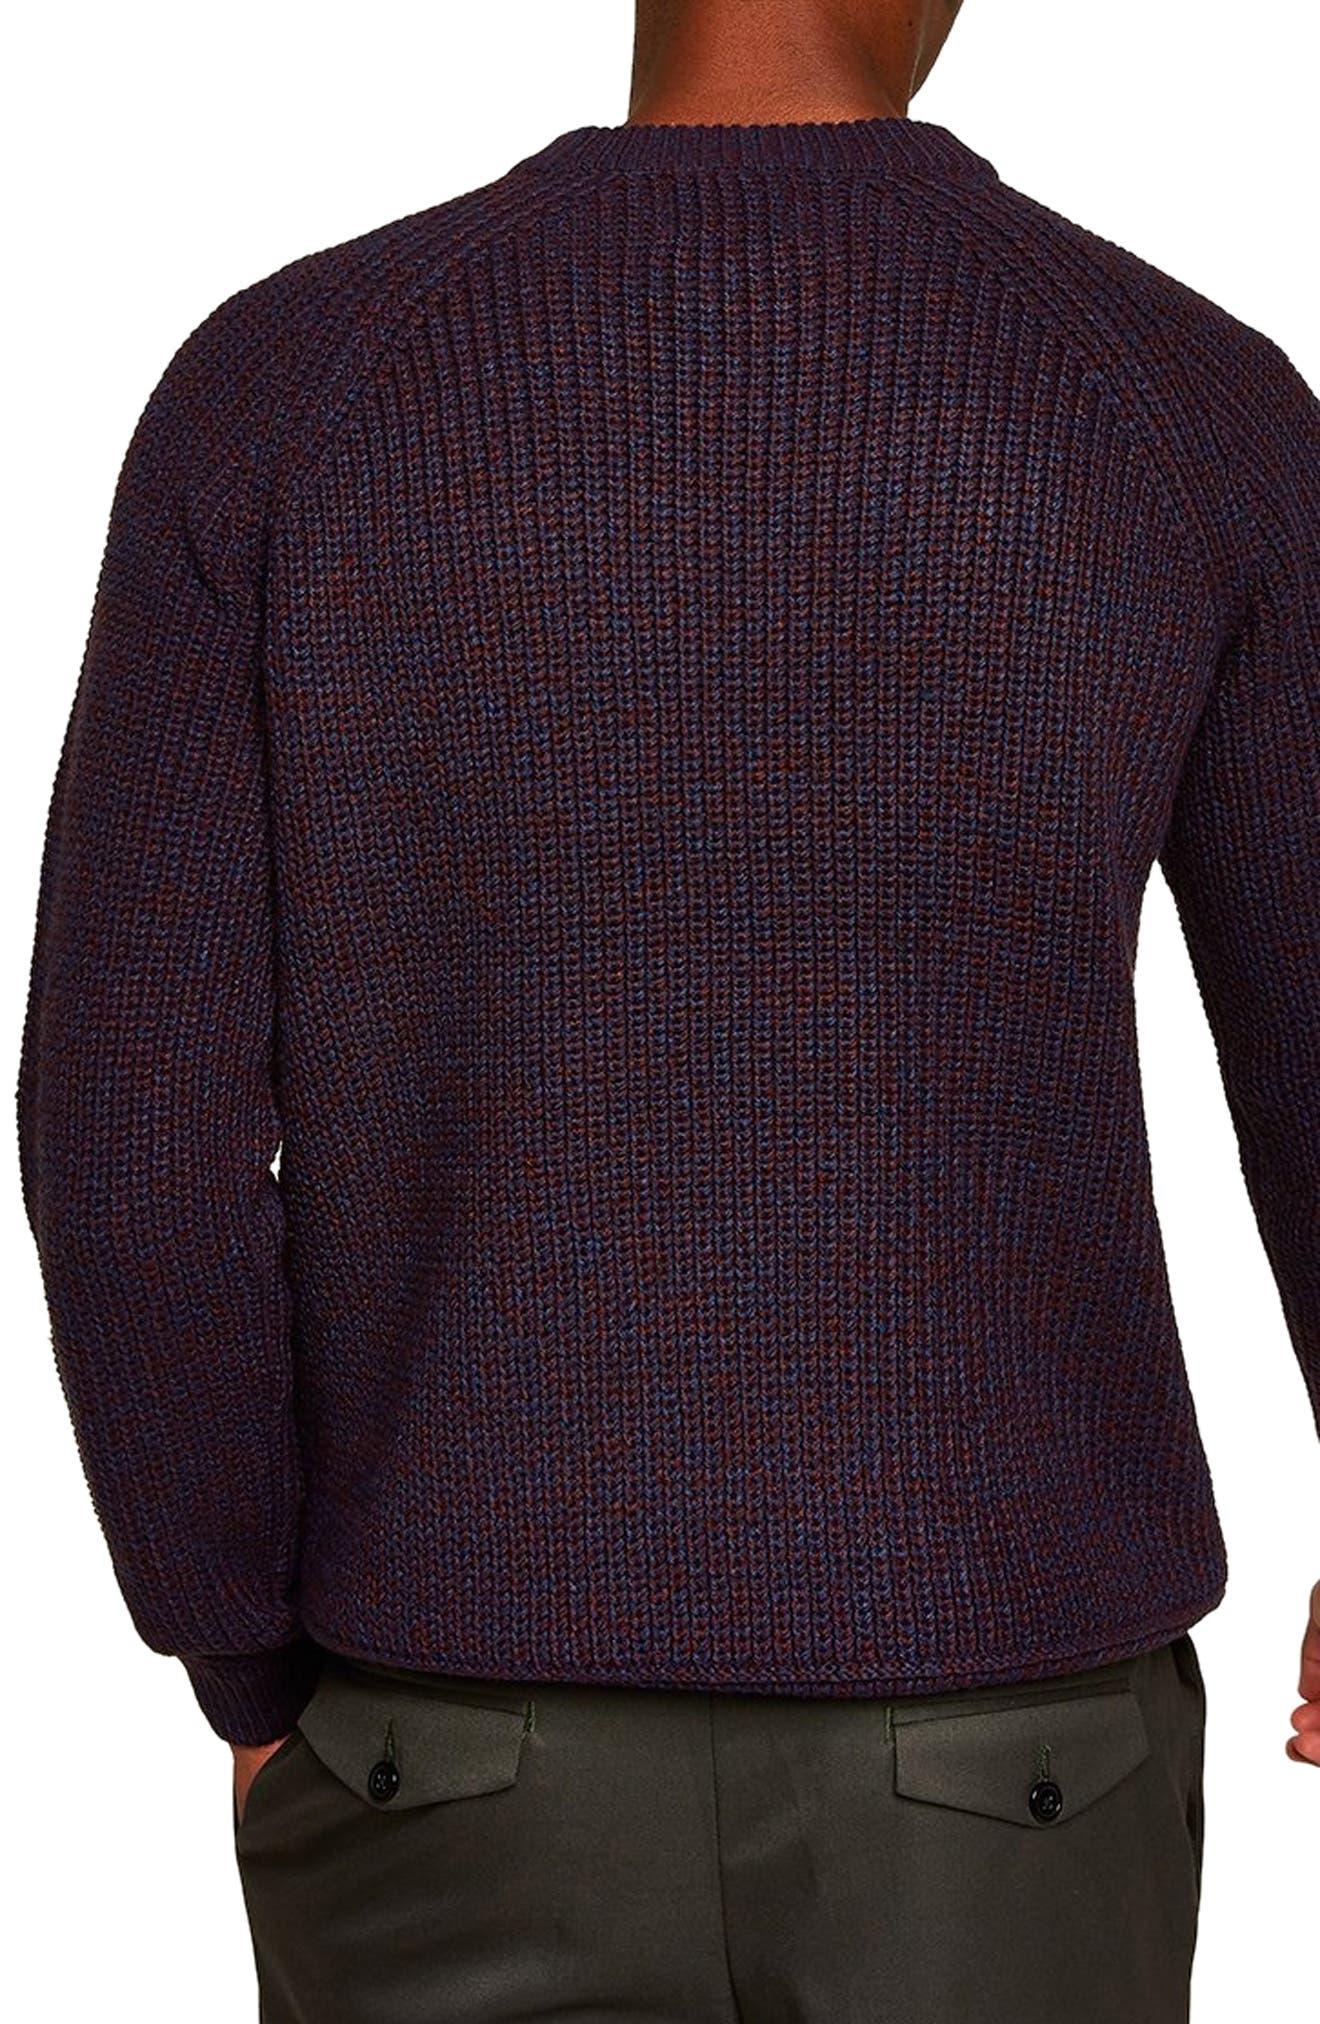 Crewneck Sweater,                             Alternate thumbnail 2, color,                             BURGUNDY MULTI